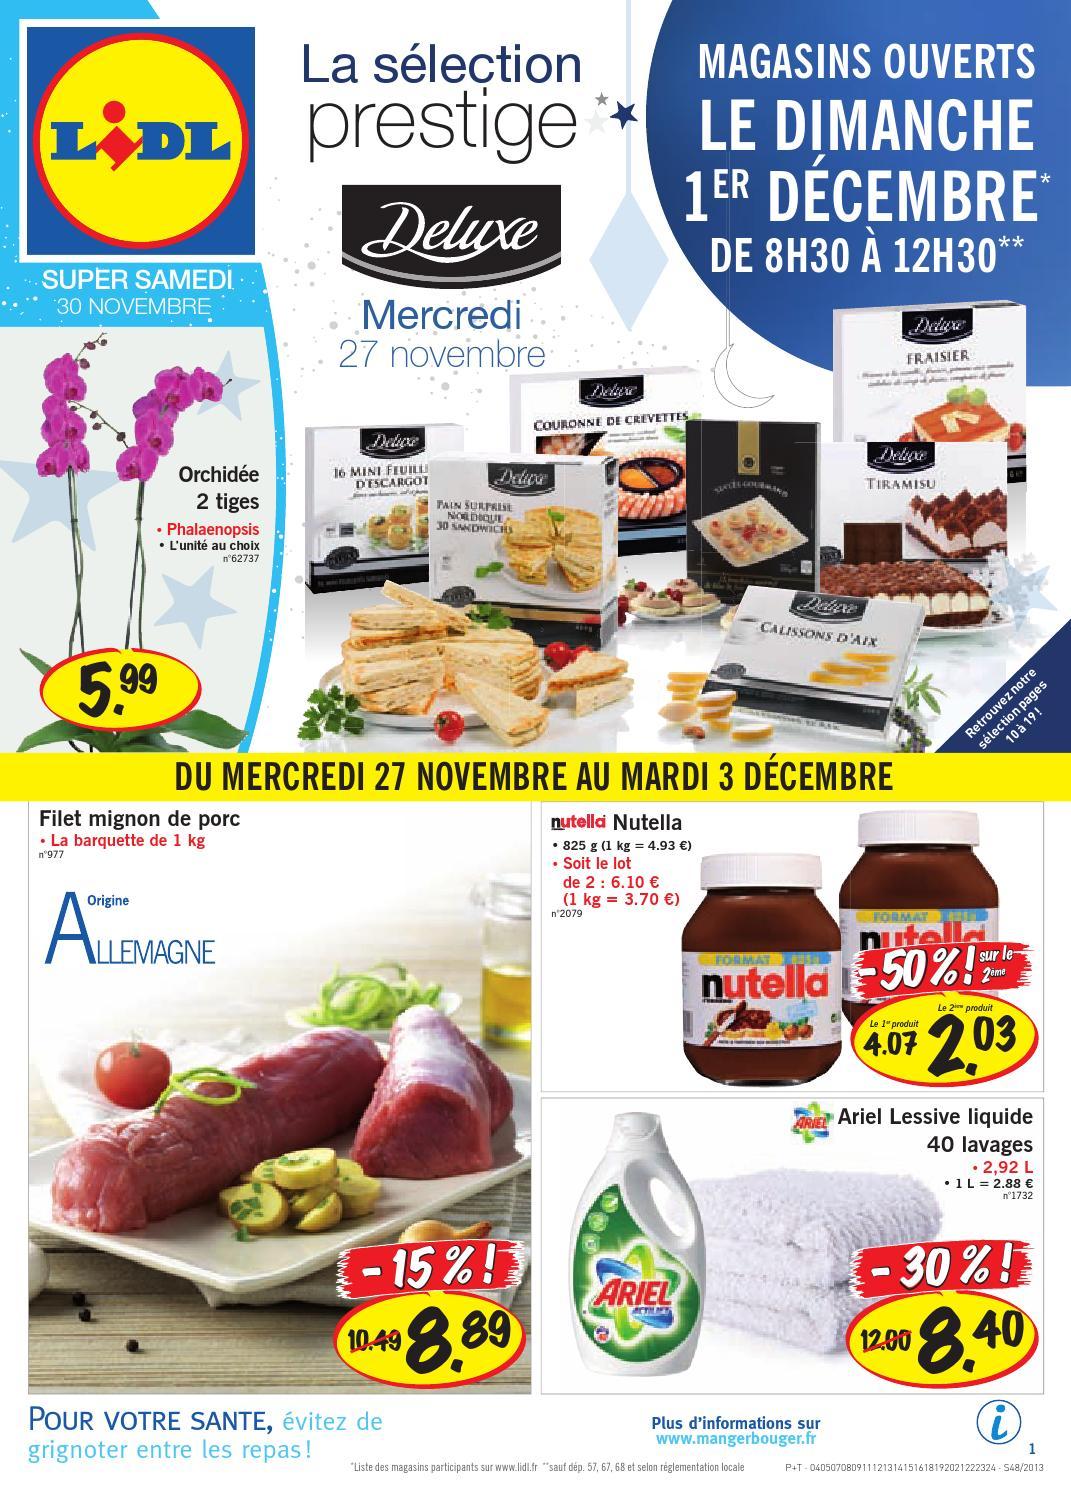 Lidl Catalogue 27novembre 3decembre2013 By Promocatalogues